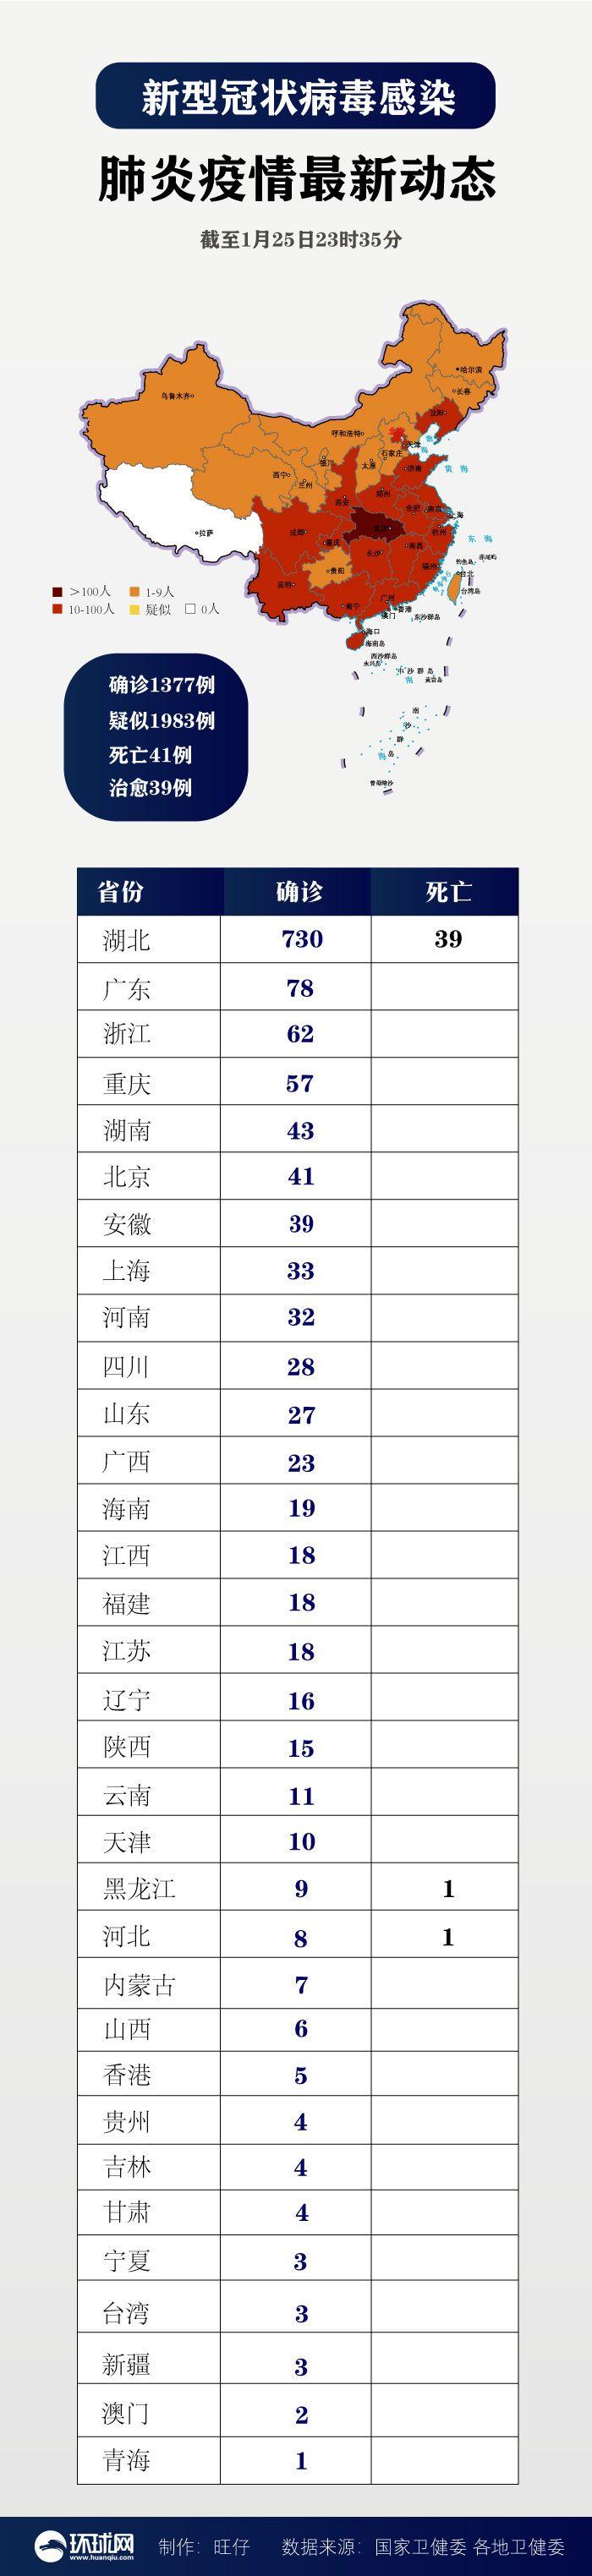 http://www.gyw007.com/nanhaixinwen/447865.html